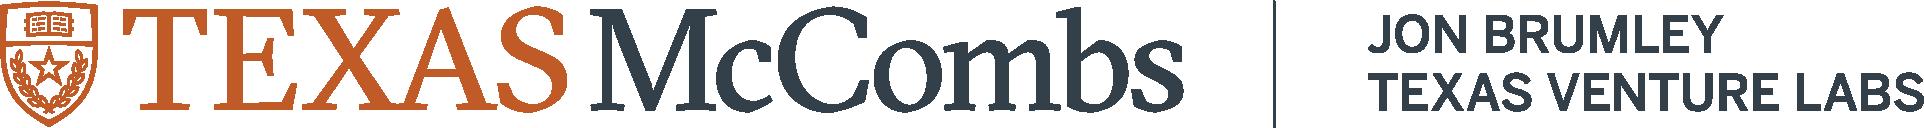 Texas Venture Labs logo